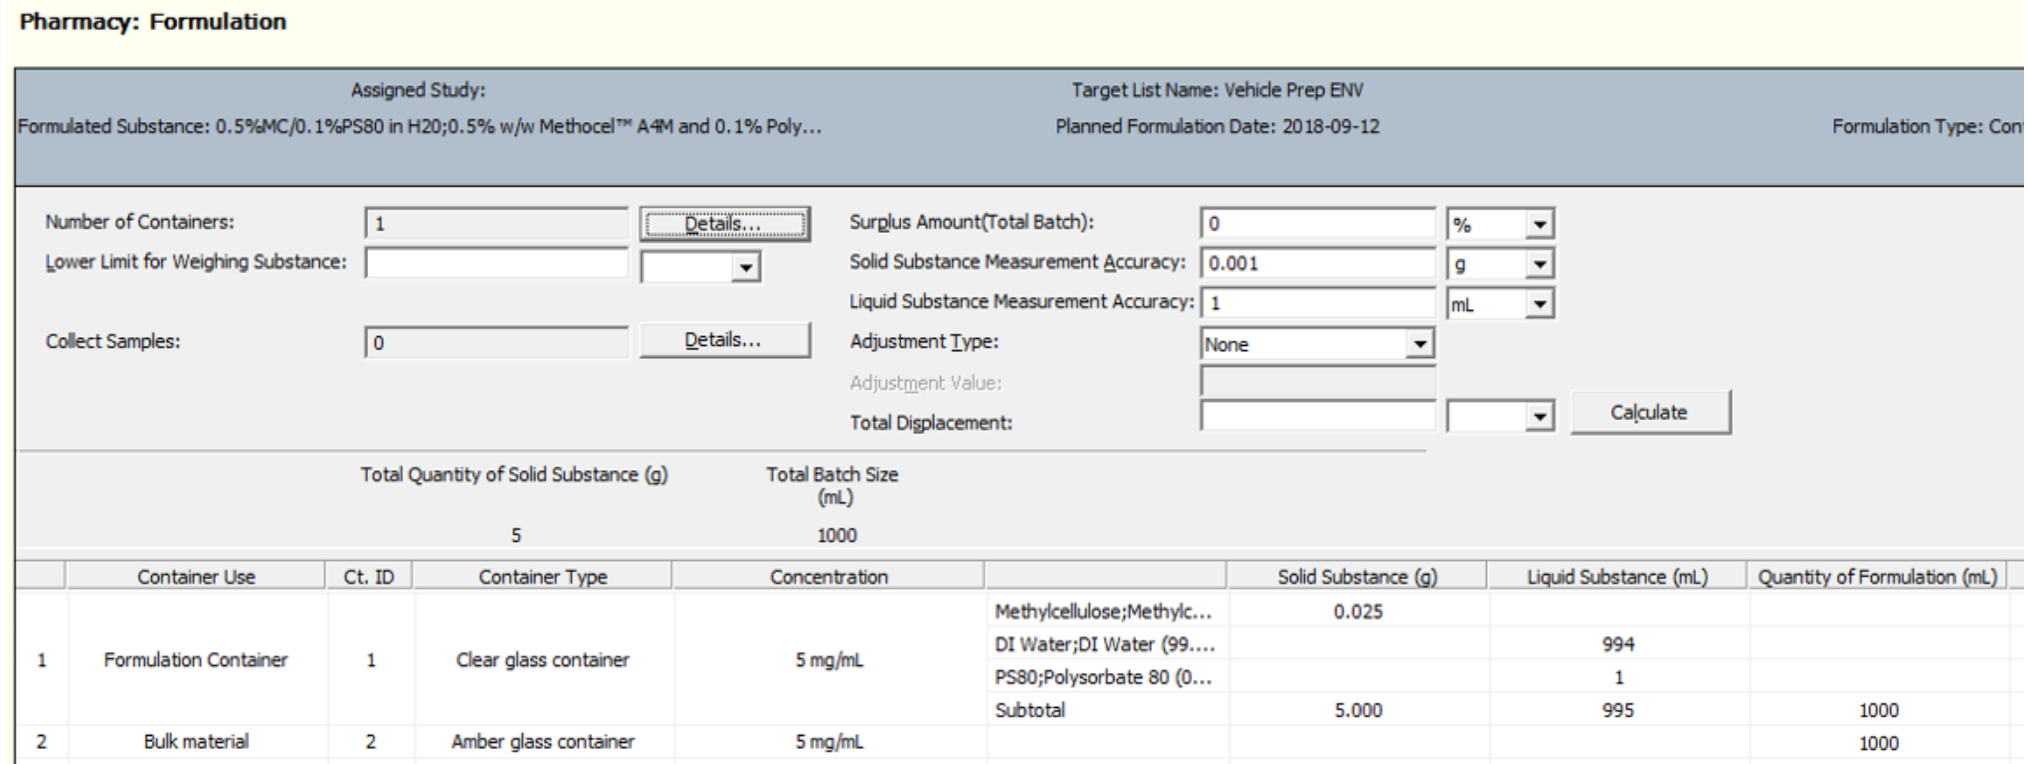 LabWise XD screenshot: Labwise XD pharmaceutical product formulation